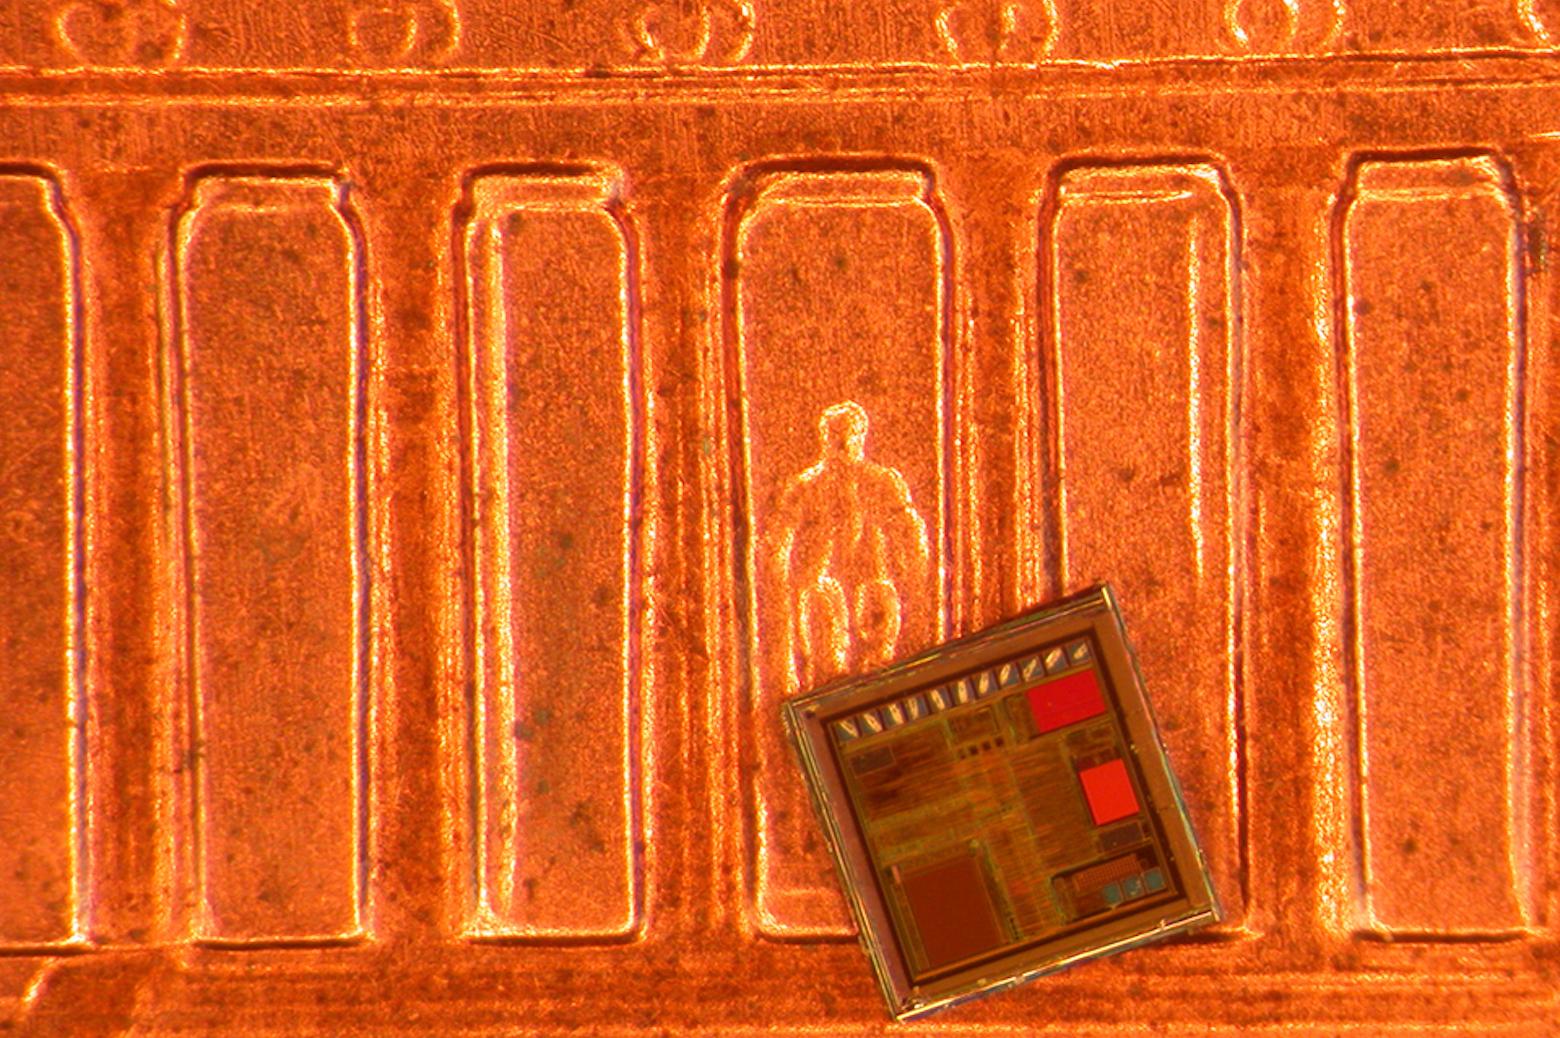 Phoenix processor on U.S. Penny